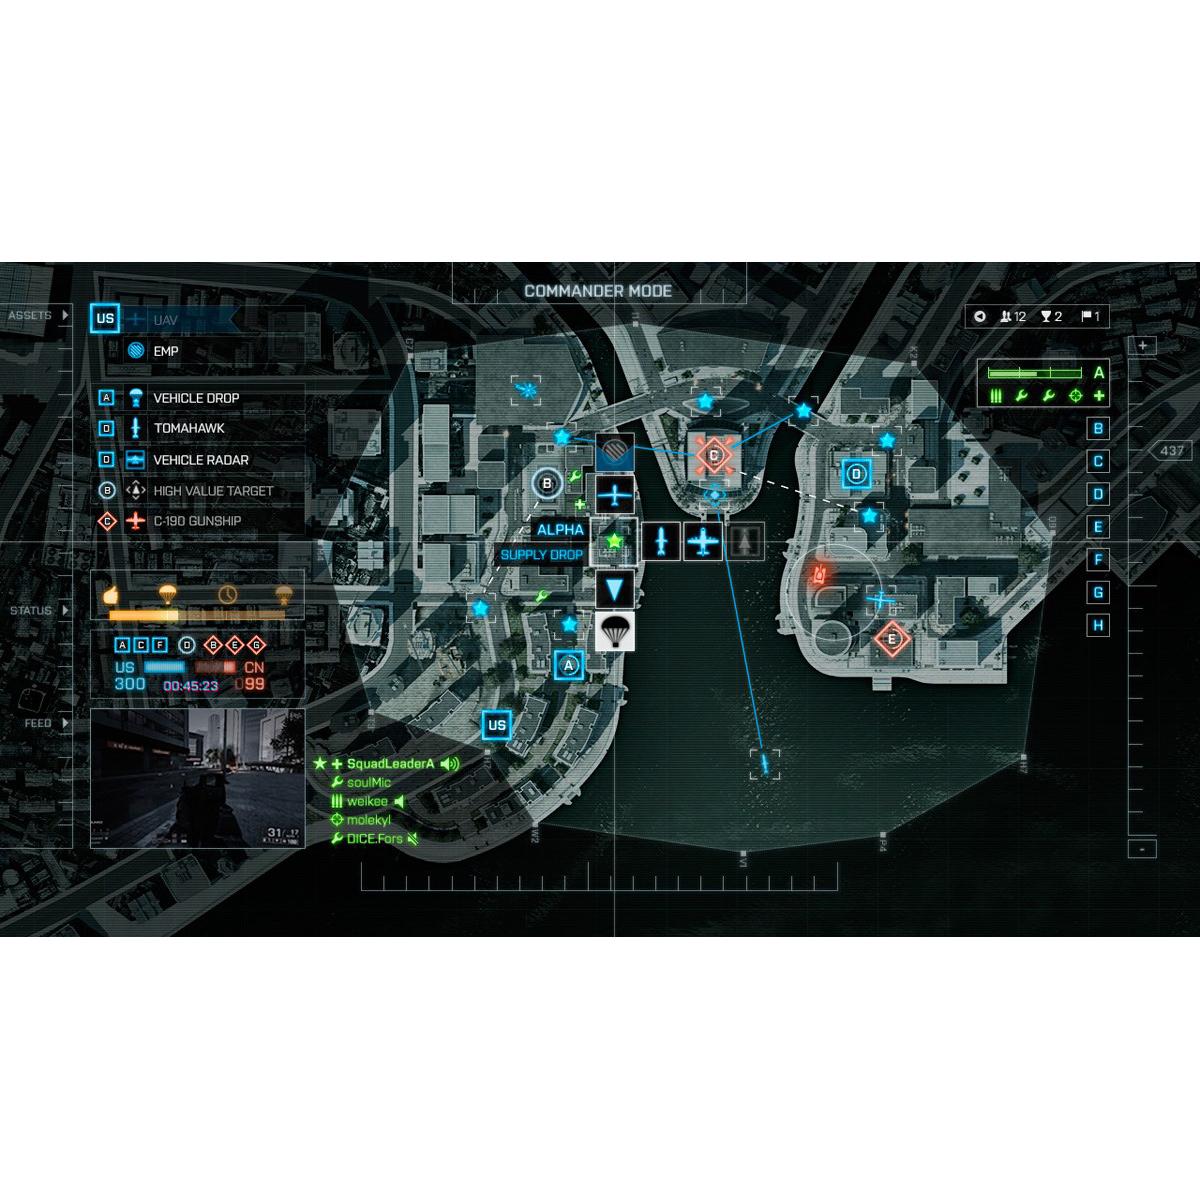 Joc Battlefield 4: Premium Edition pentru Xbox ONE 15